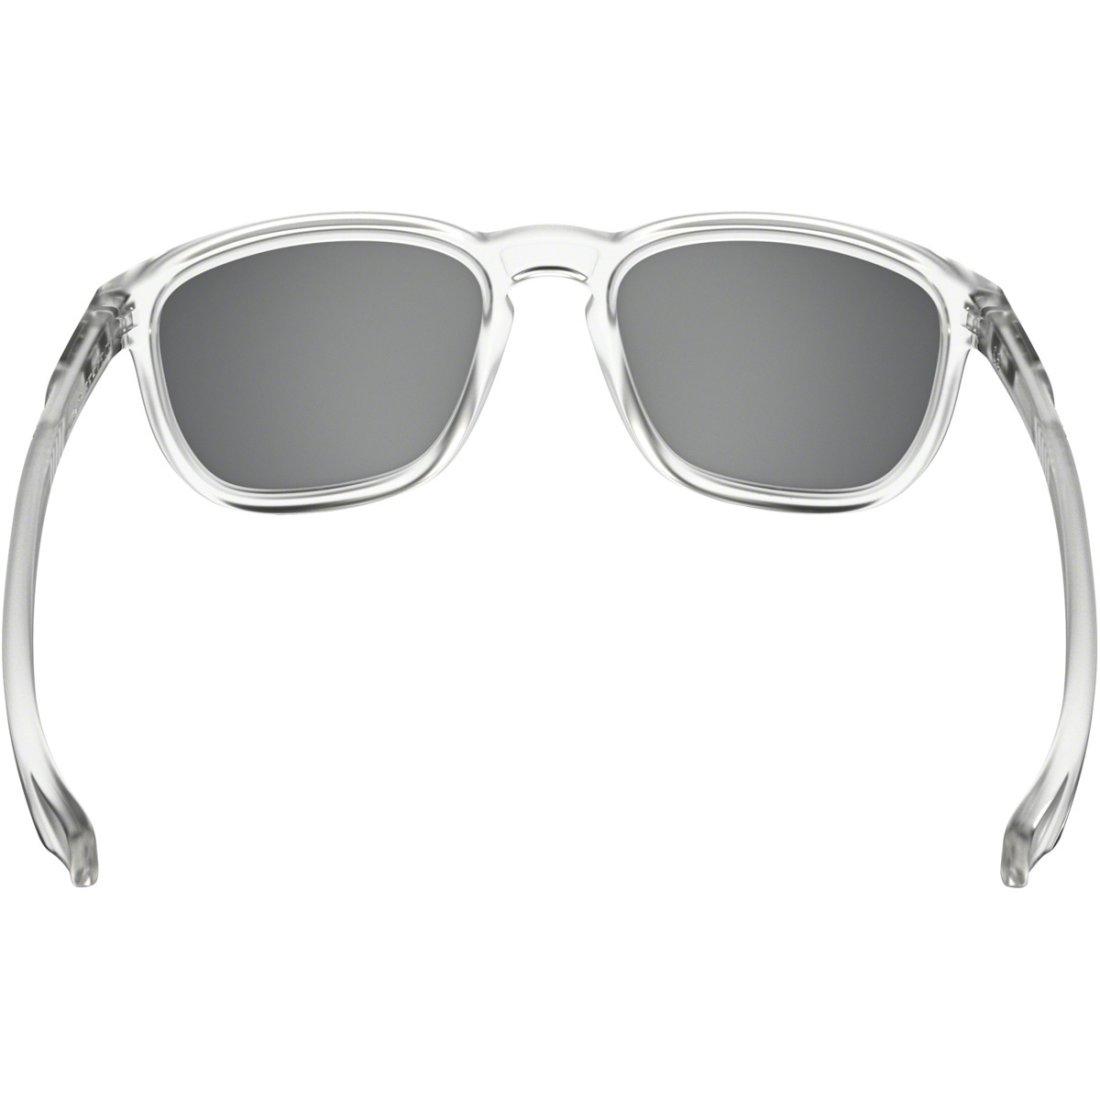 Enduro Clear De Sol Oakley Gafas Motocard · Matte Iridium Chrome qUMzpVS